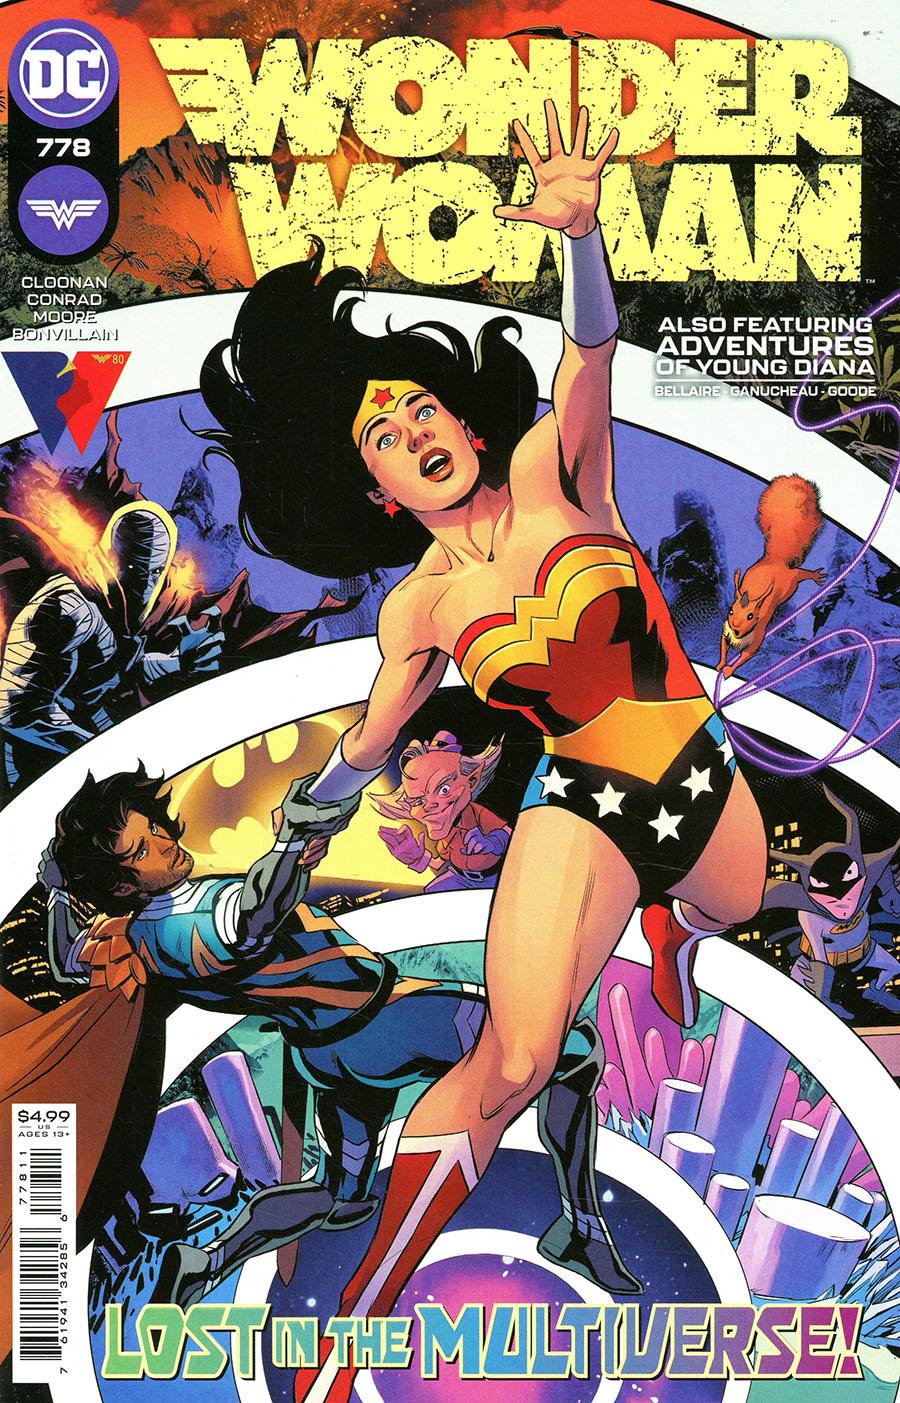 Wonder Woman Vol 5 #778 Cover A Regular Travis Moore Cover